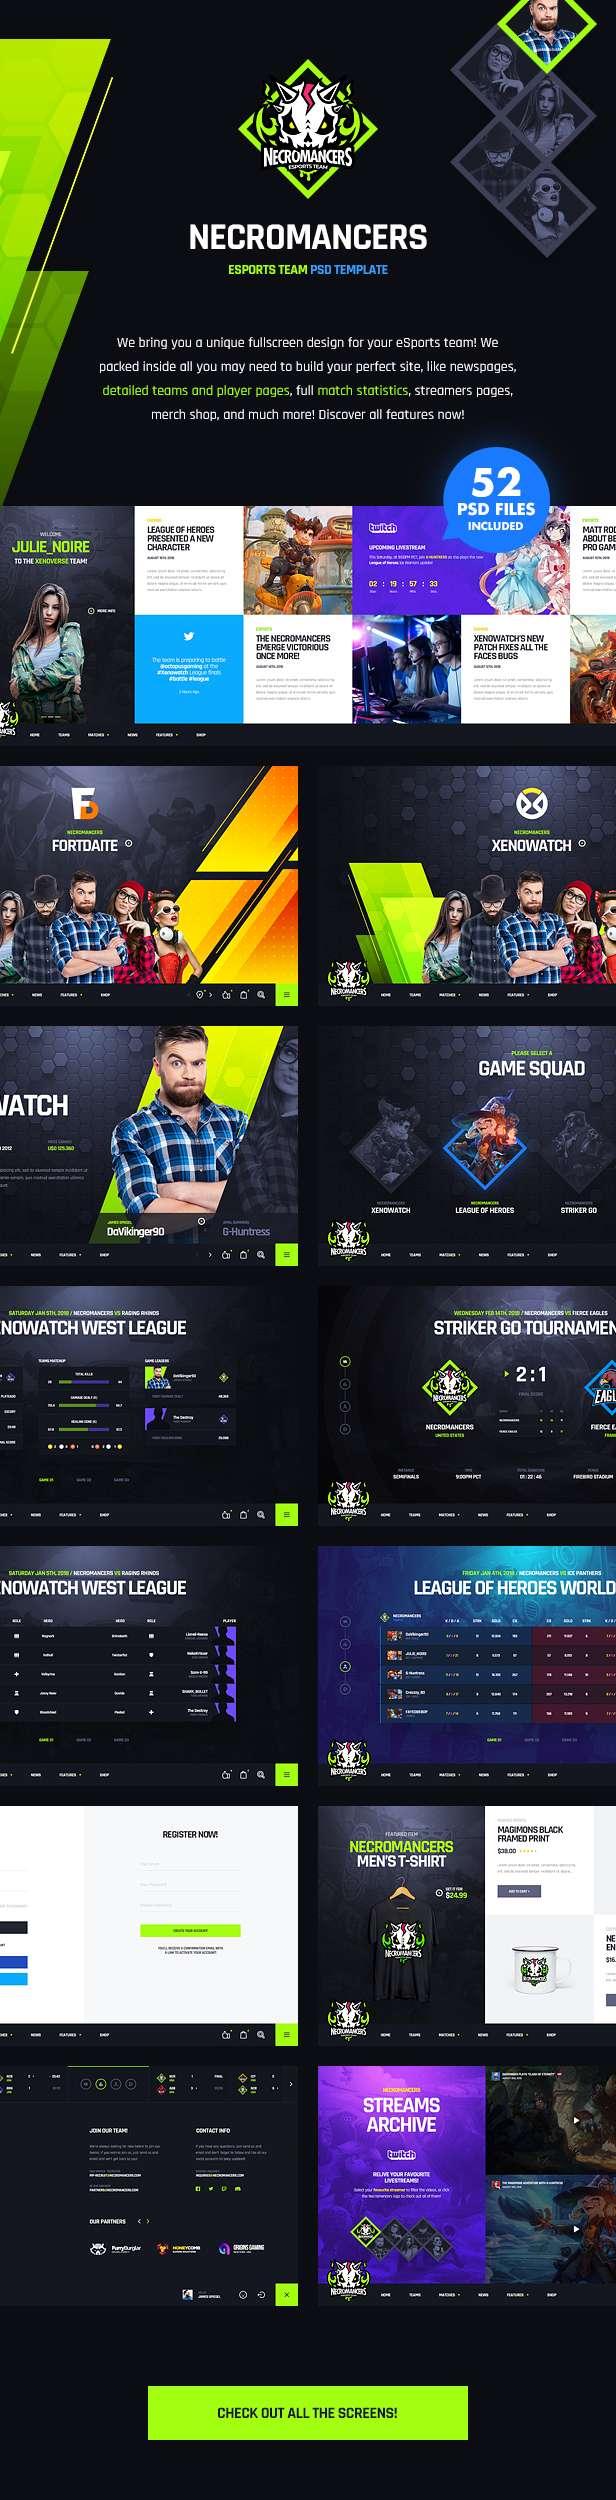 Necromancers - eSports Team PSD Template - 12